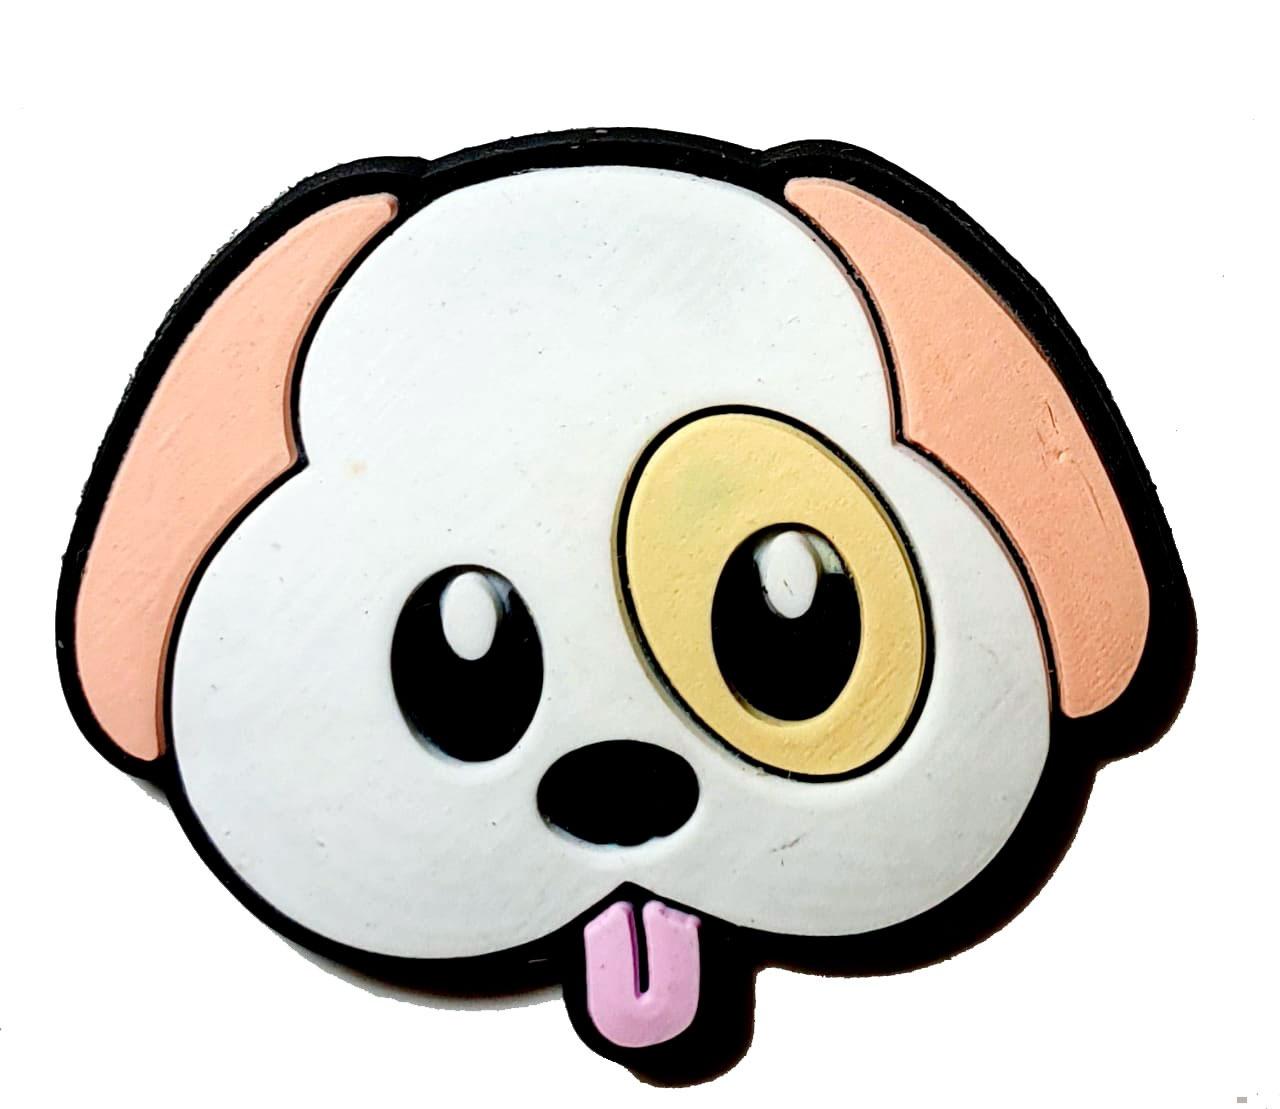 Cachorro Emborrachado